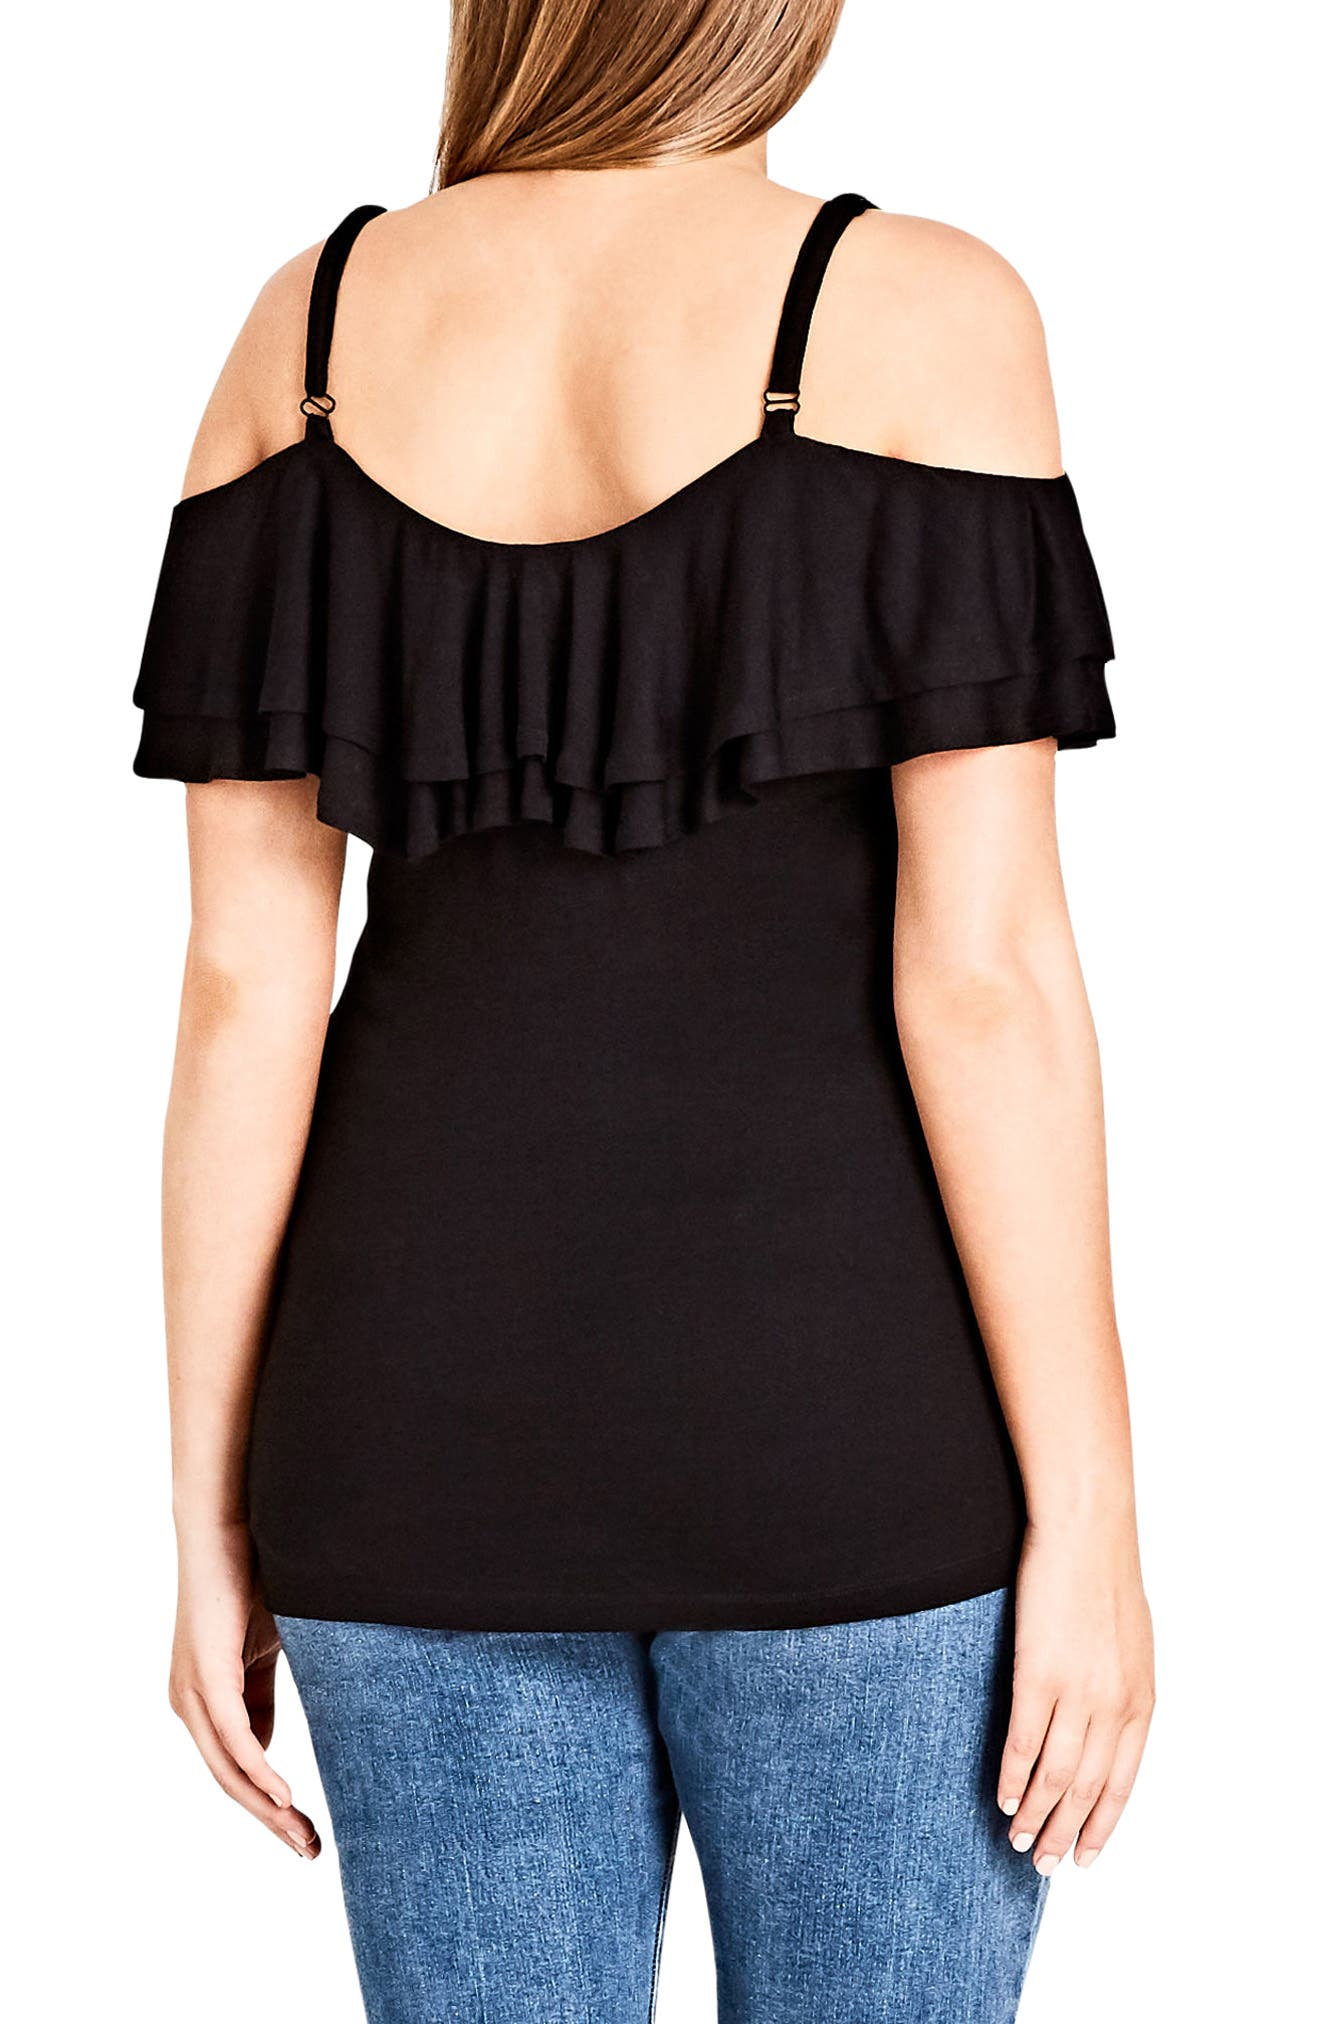 Alternate Image 2  - City Chic Ruffle Romance Off the Shoulder Top (Plus Size)